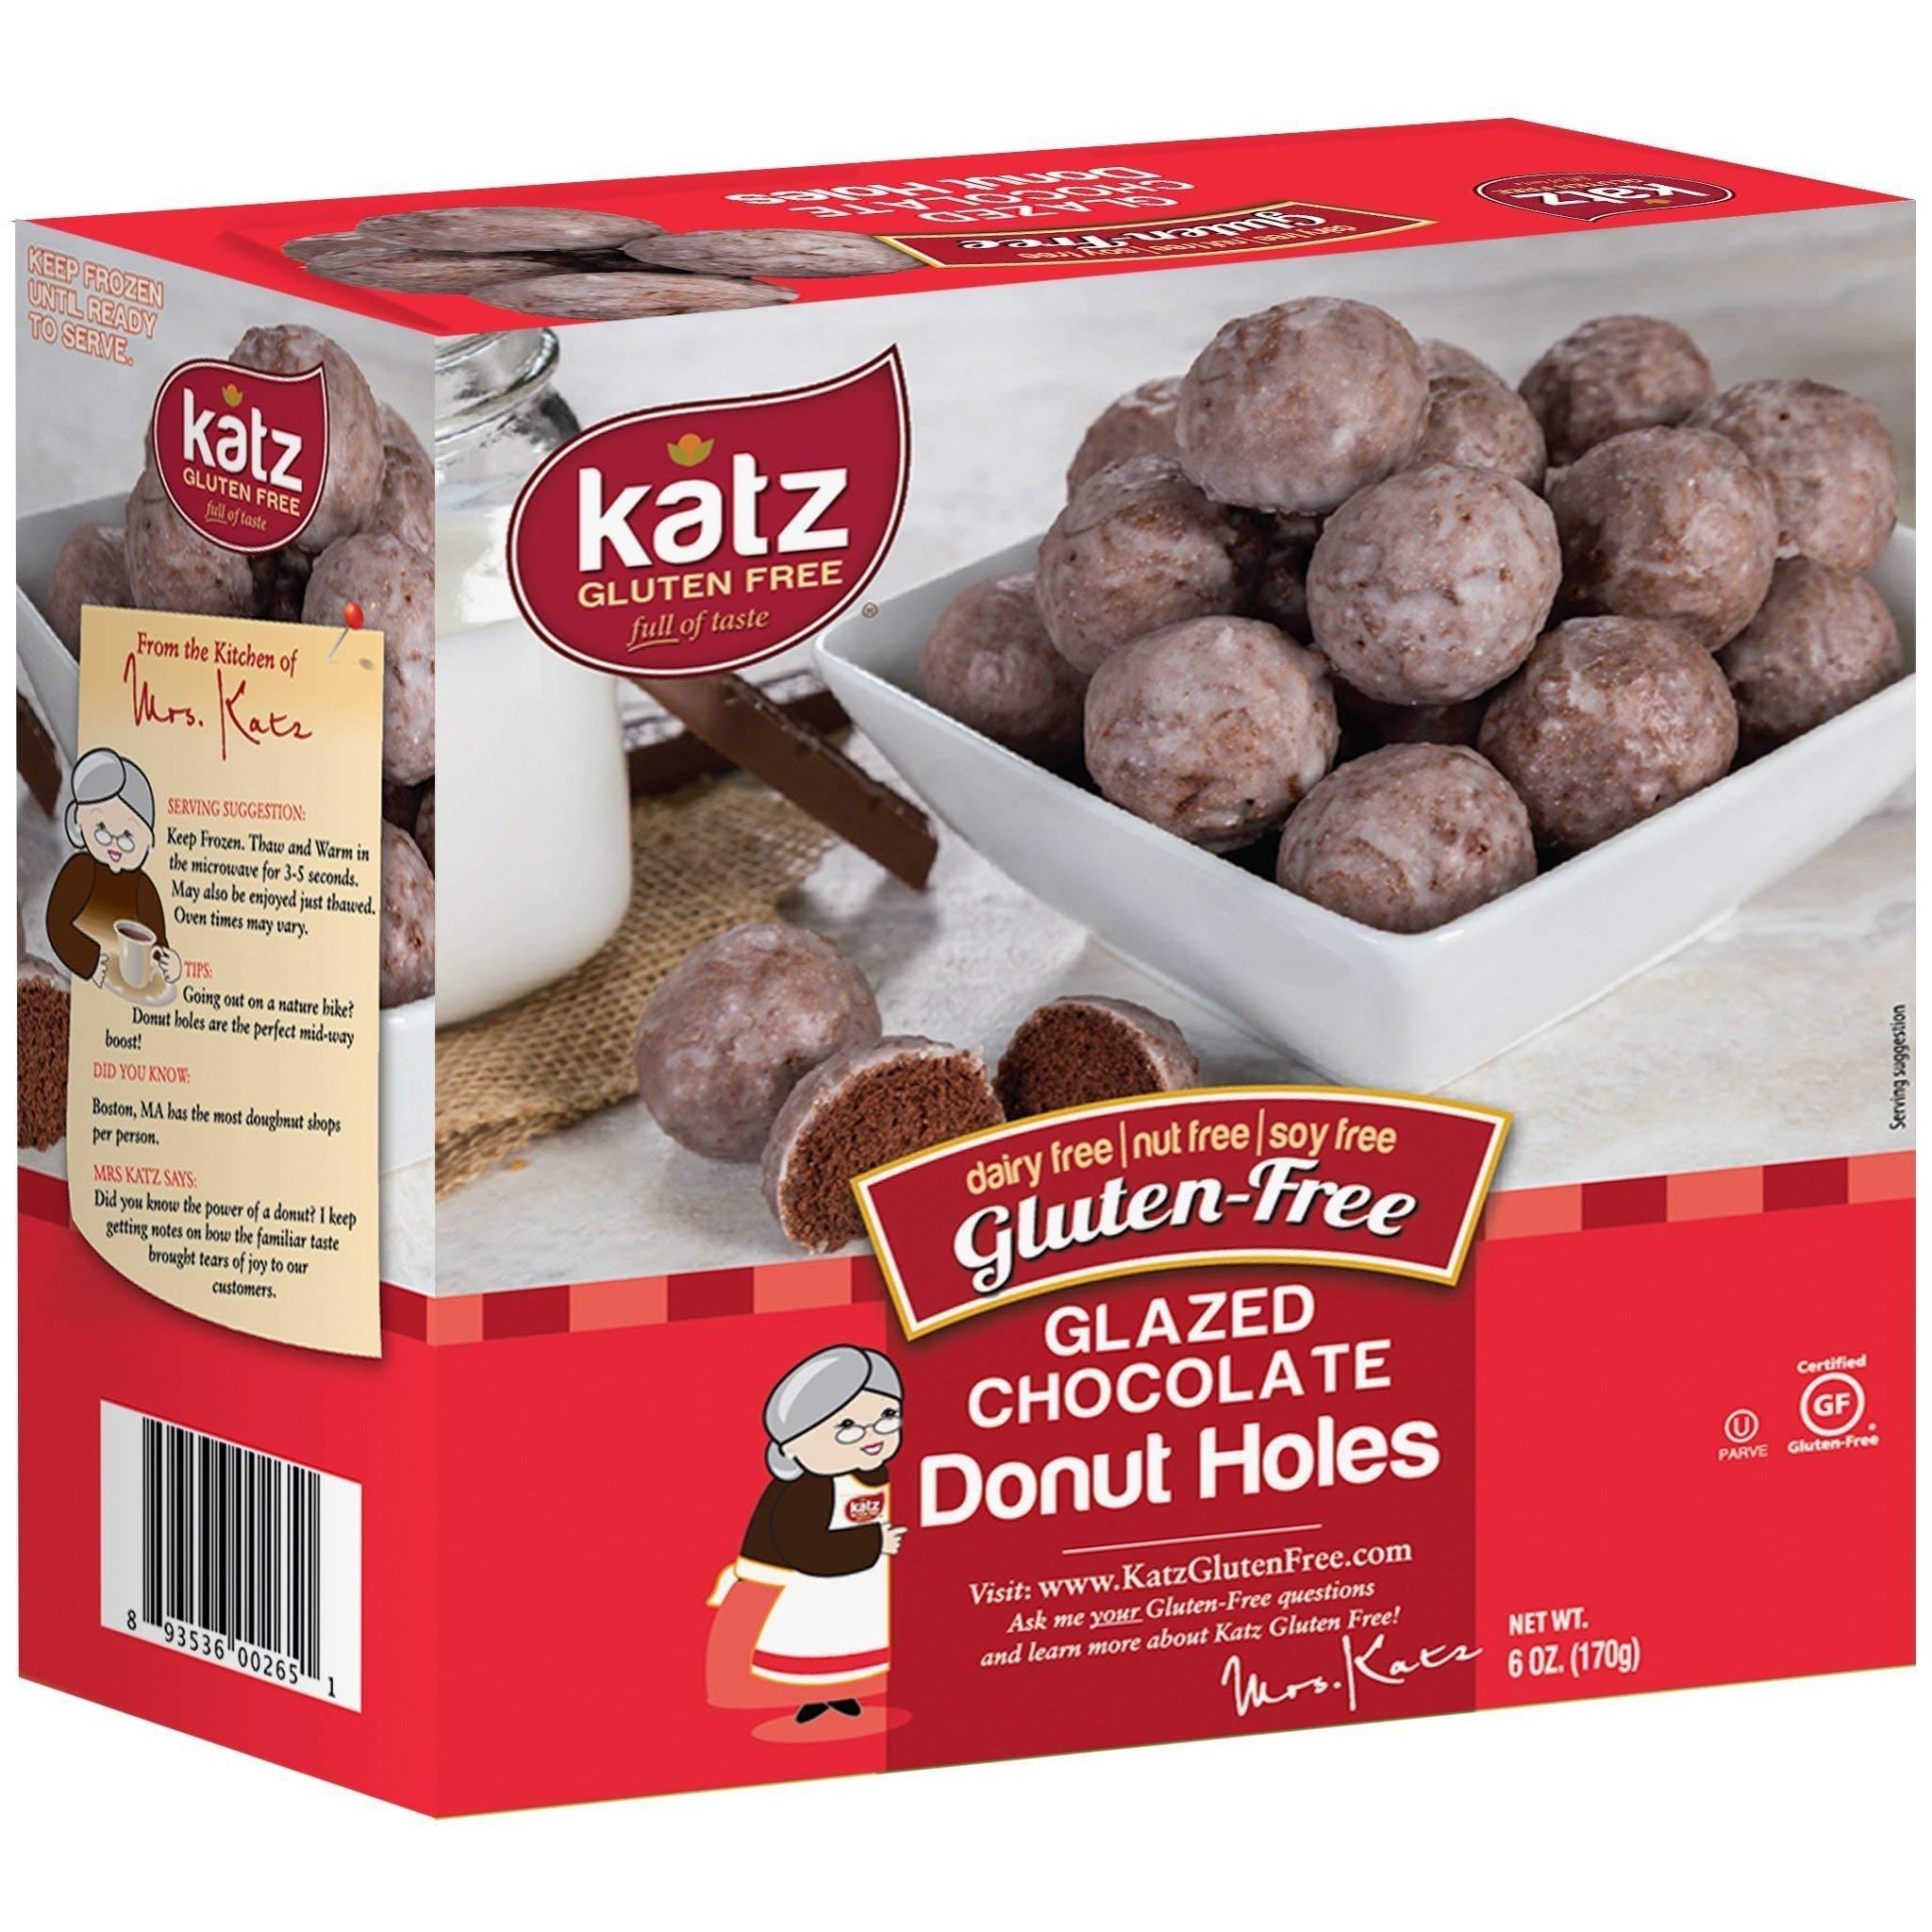 Katz Gluten Free Glazed Chocolate Donut Holes | Dairy, Nut, Soy and Gluten Free | Kosher (3 Packs, 6 Ounce Each) by Katz Gluten Free